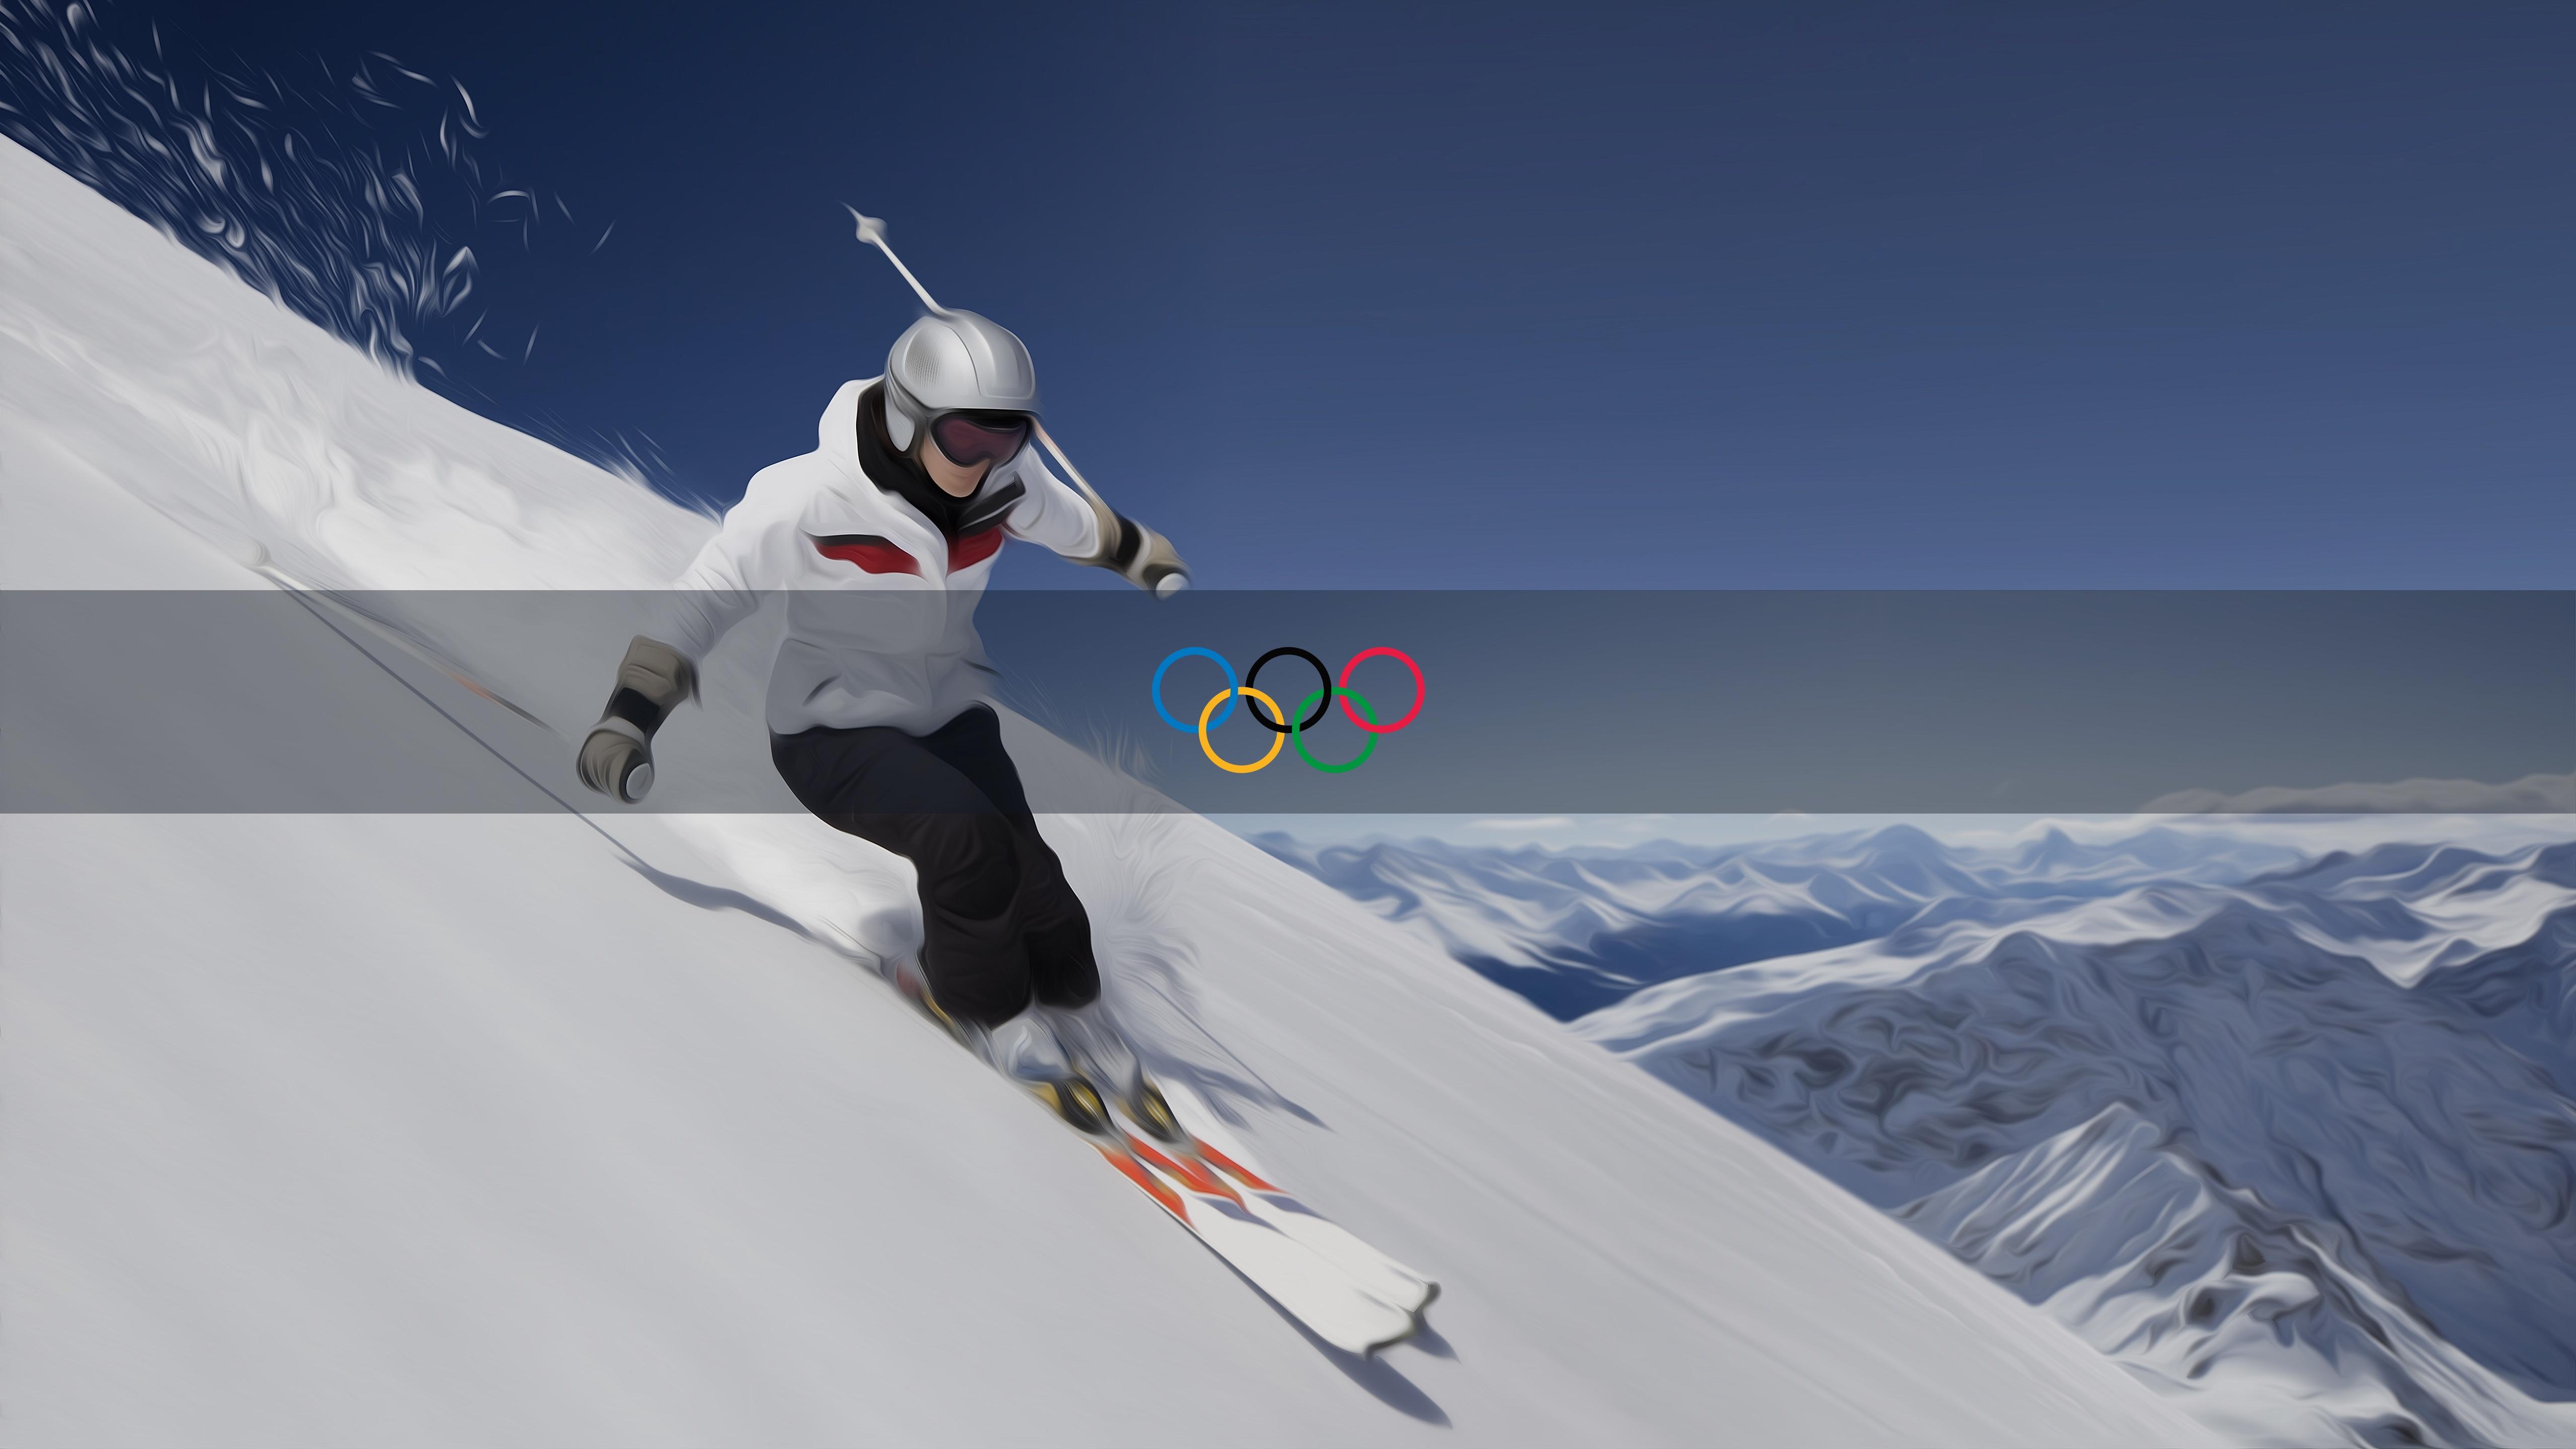 Wallpaper Inside Iphone X Pyeongchang Winter Olympics Wallpaper